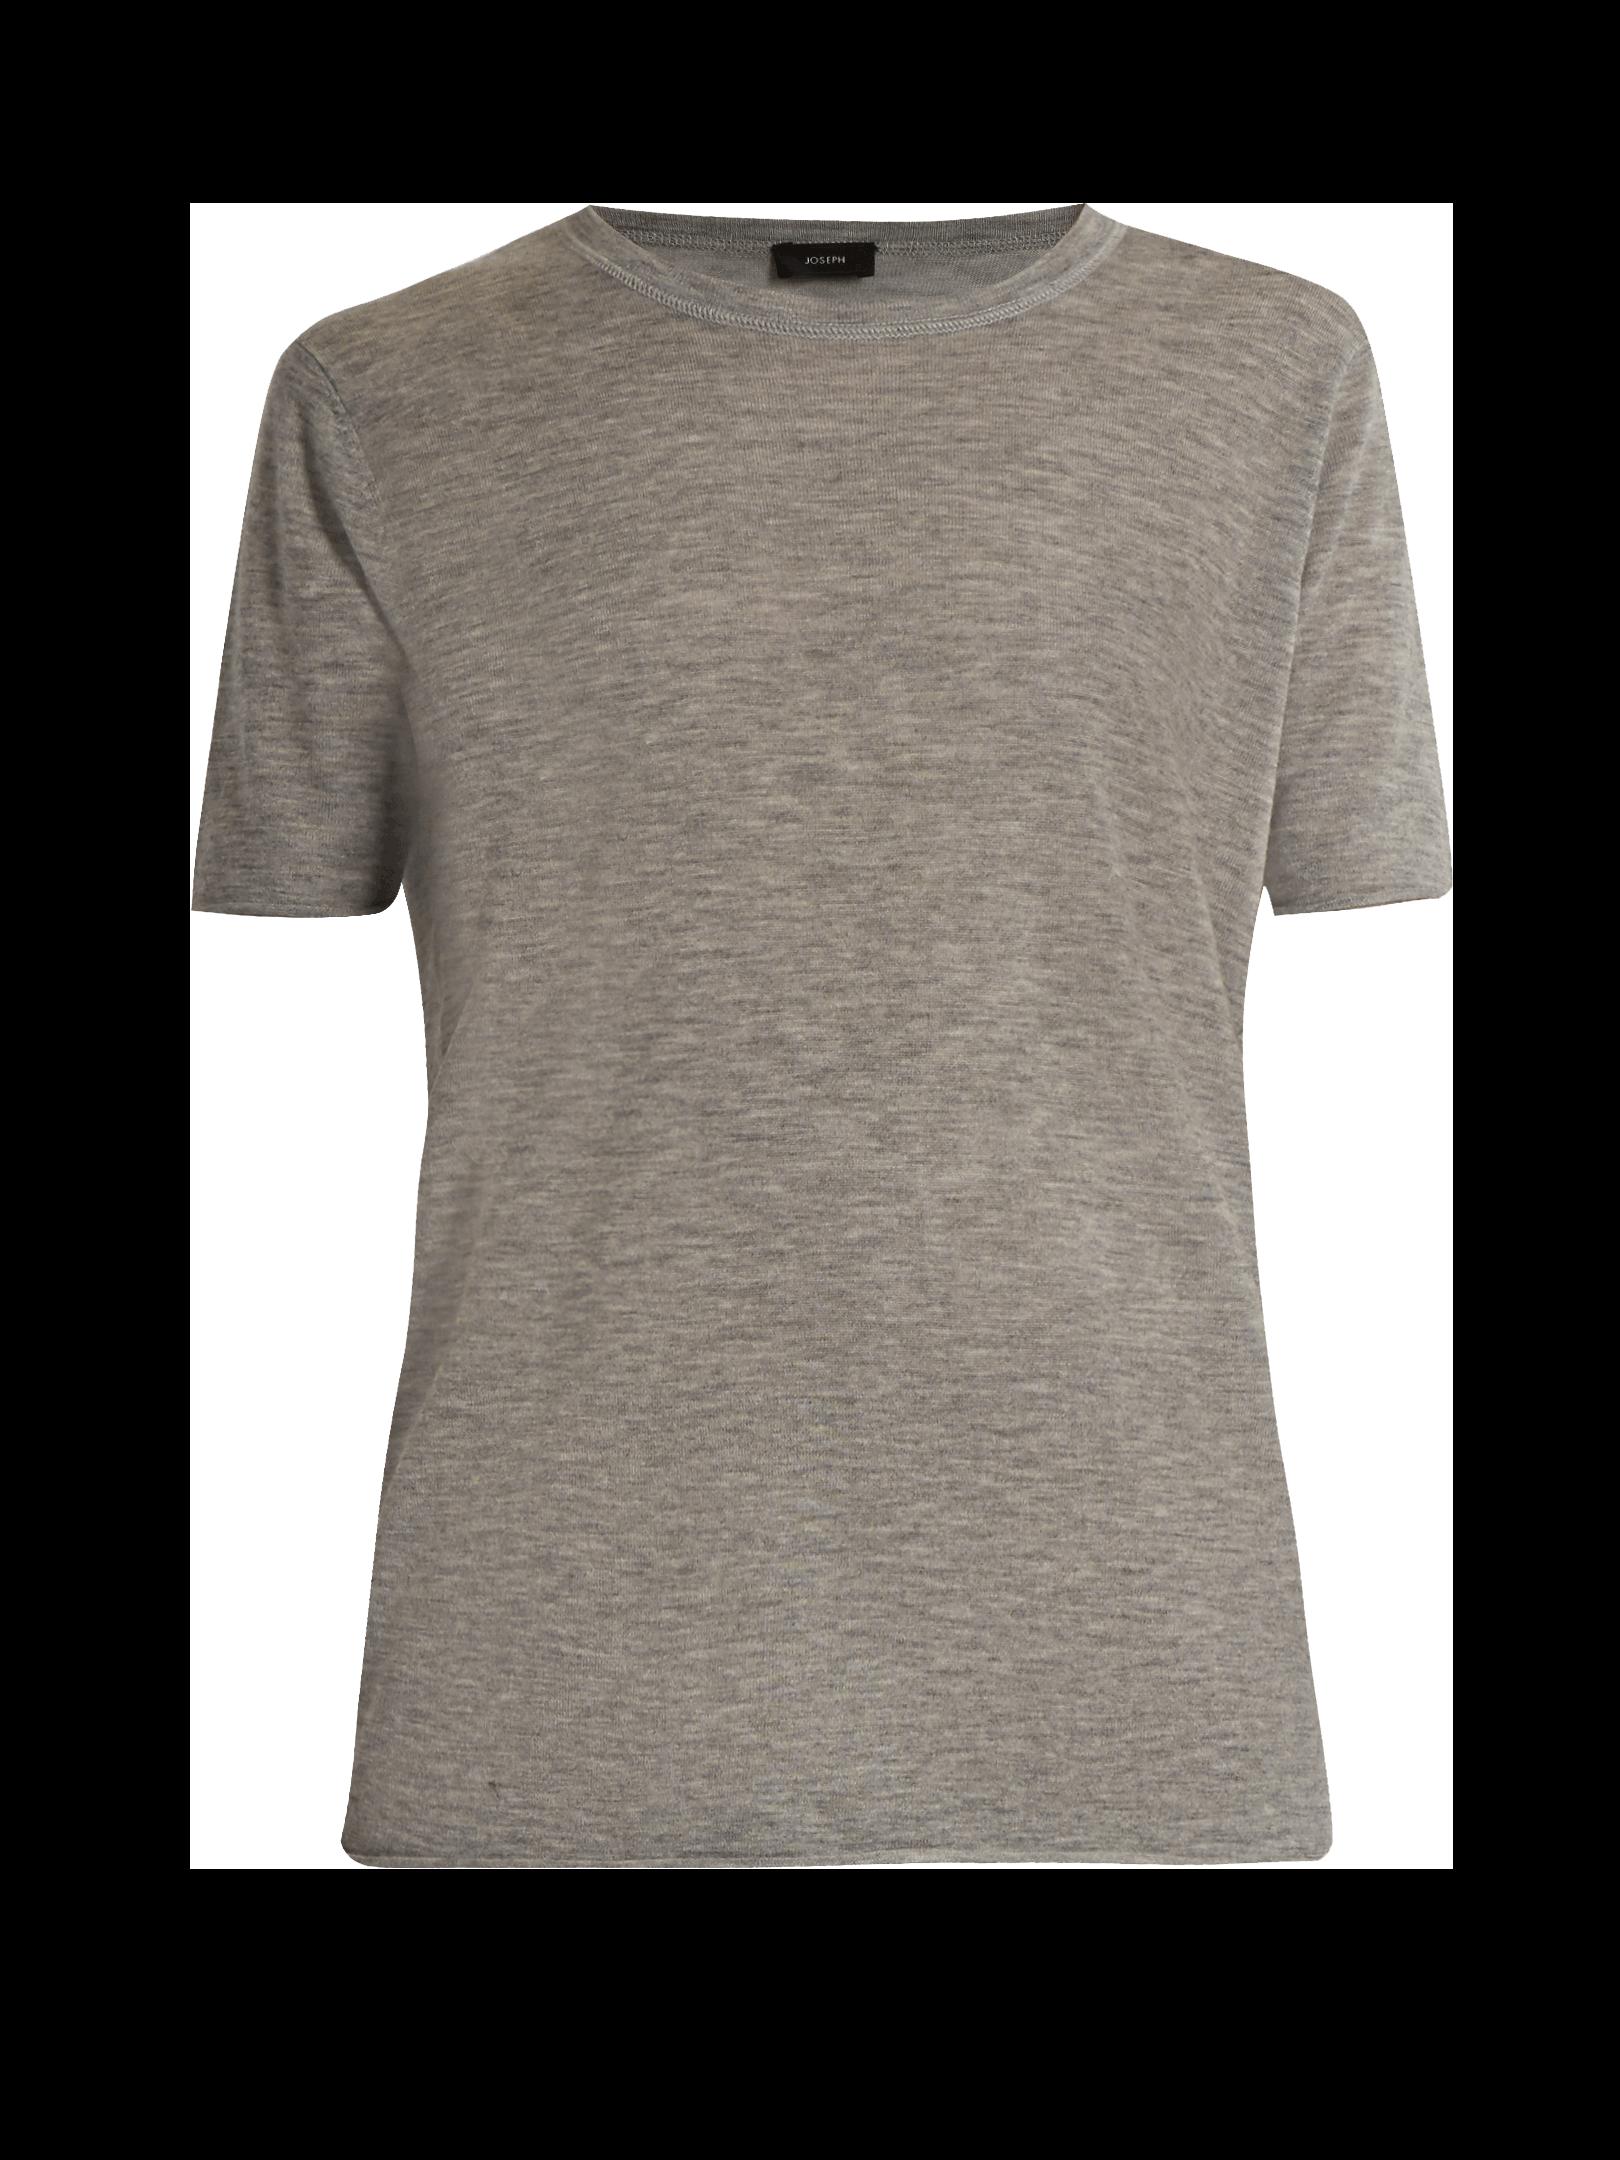 JOSEPH Cashair crew-neck cashmere T-shirt